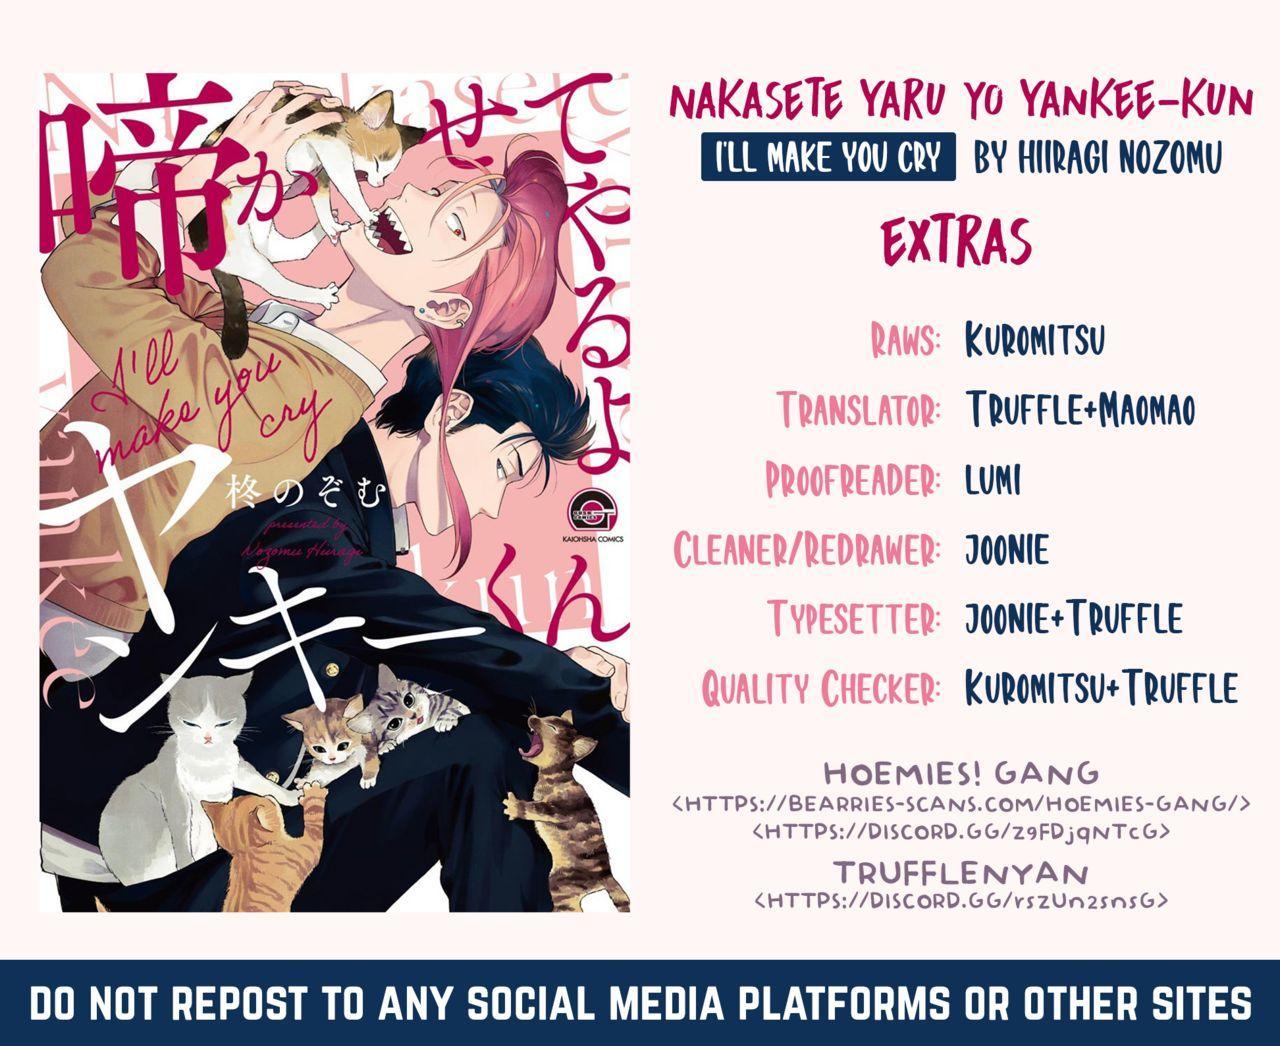 [Hiiragi Nozomu] Nakasete Yaru yo Yankee-kun   I'll Make You Cry Ch. 1-5 + Extras [English] [Digital] 193